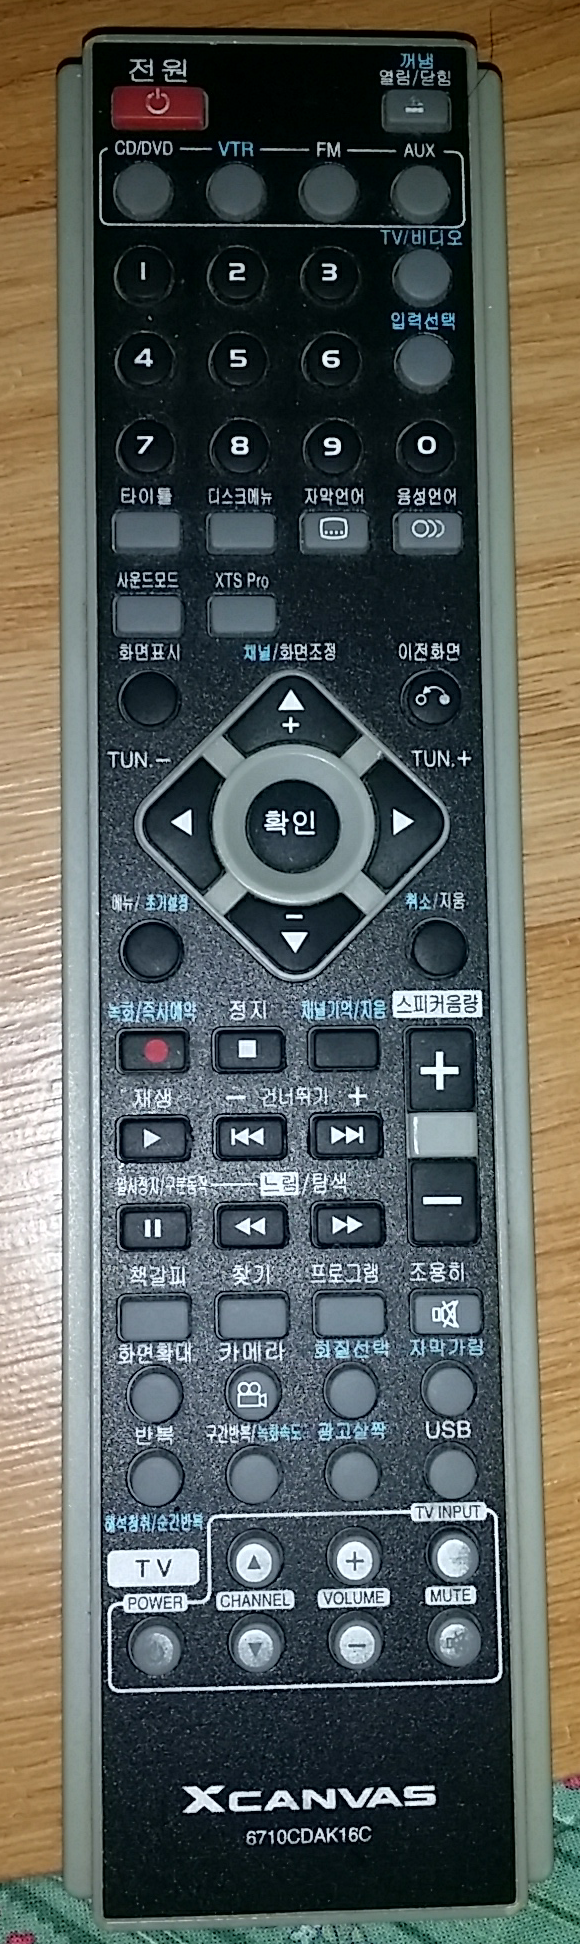 LG_HC532-6710CDAK16C_TV_cover.png